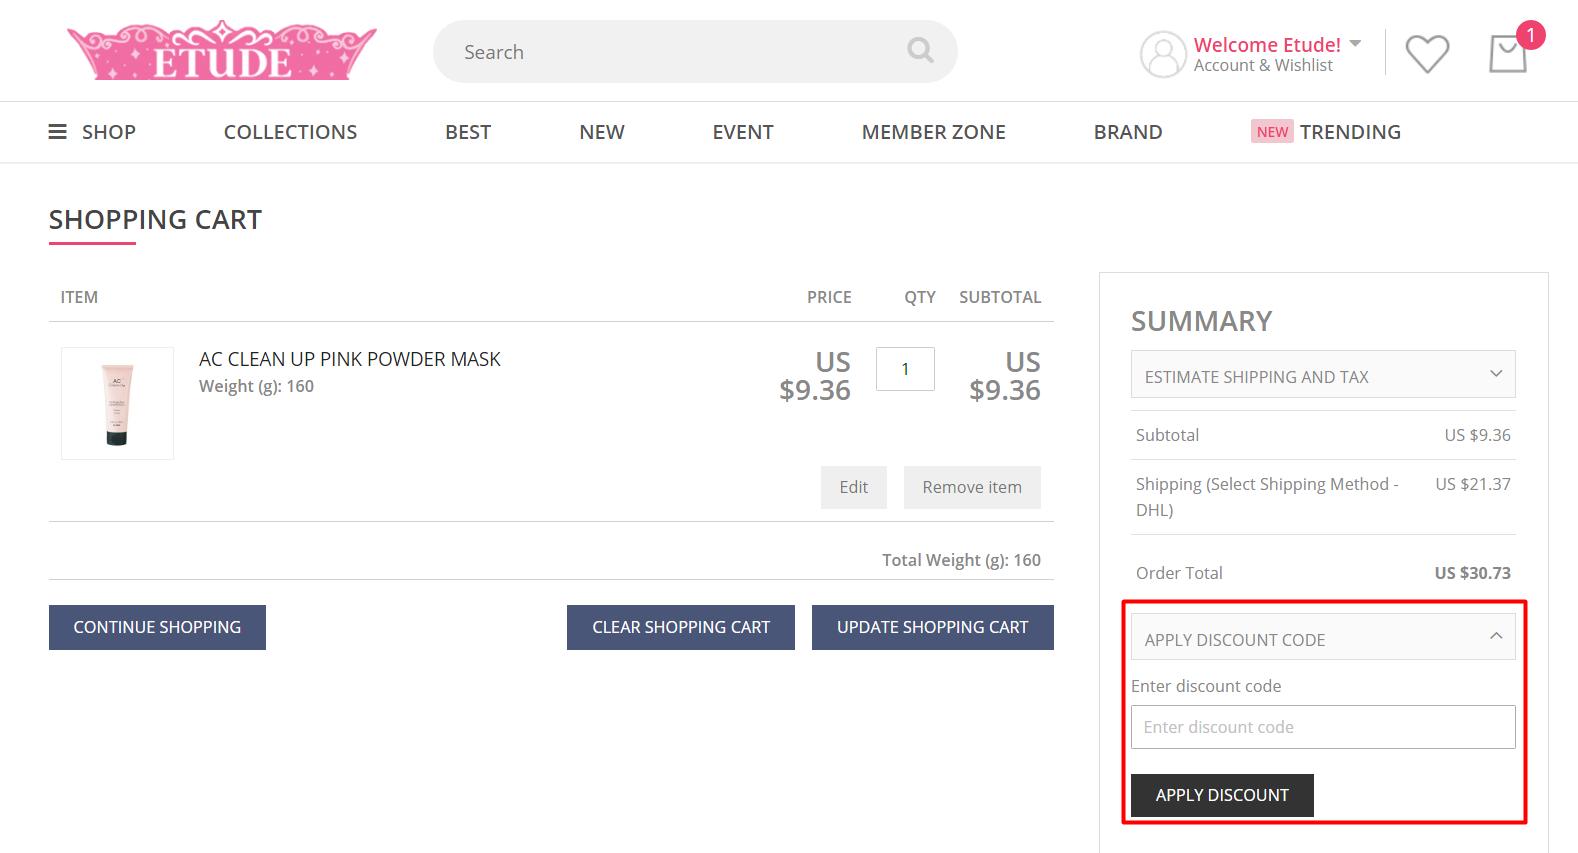 How do I use my ETUDE discount code?